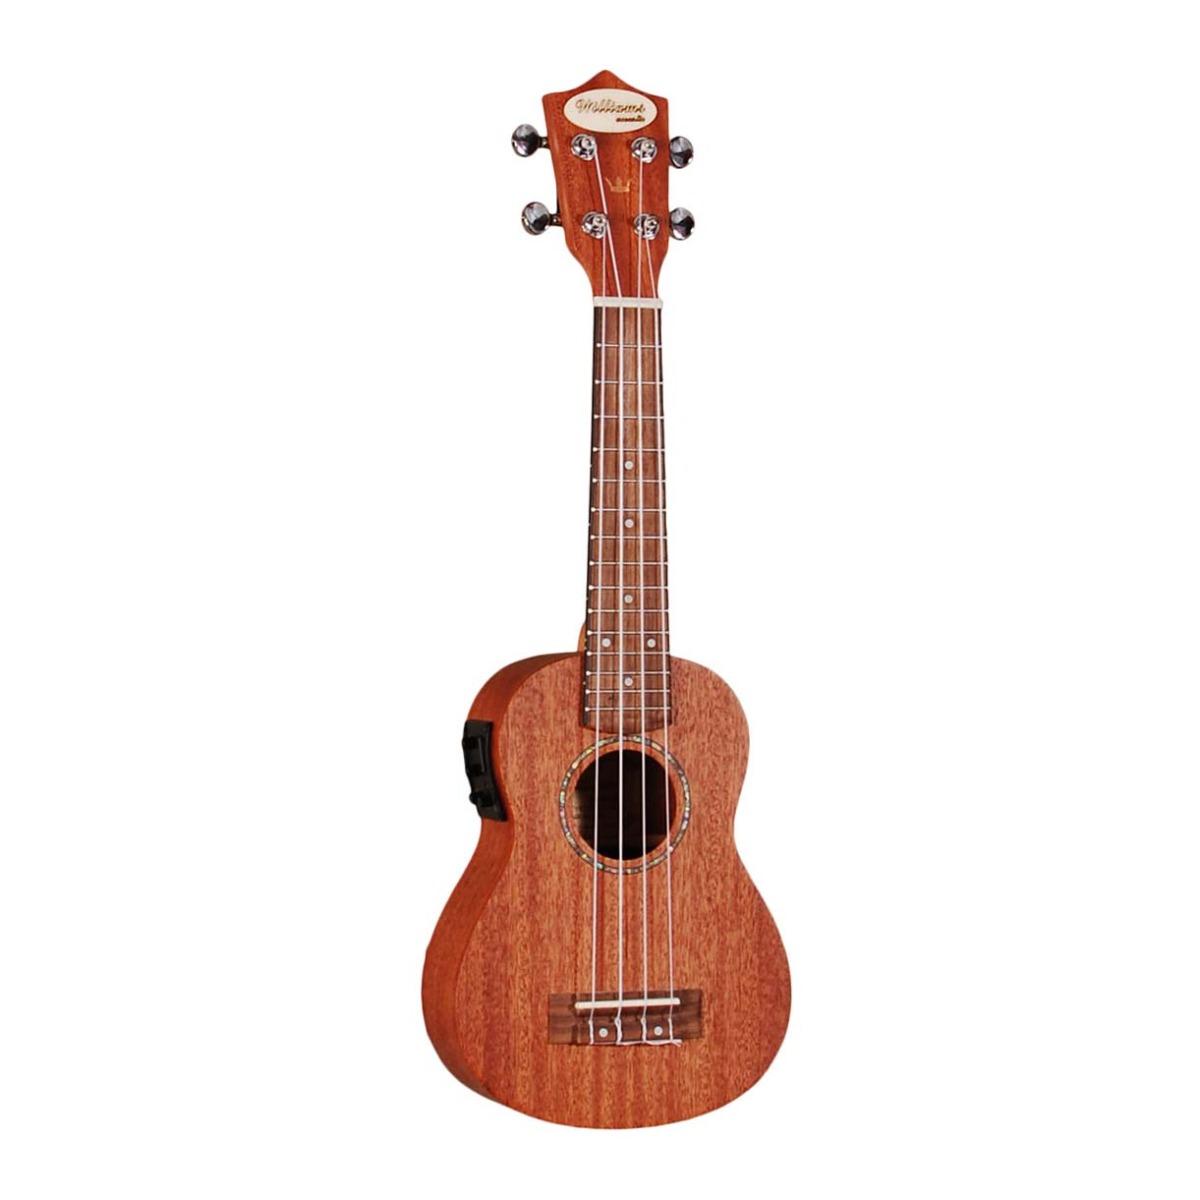 Williams Acoustic EU100S-EQ v2 sopran ukulele